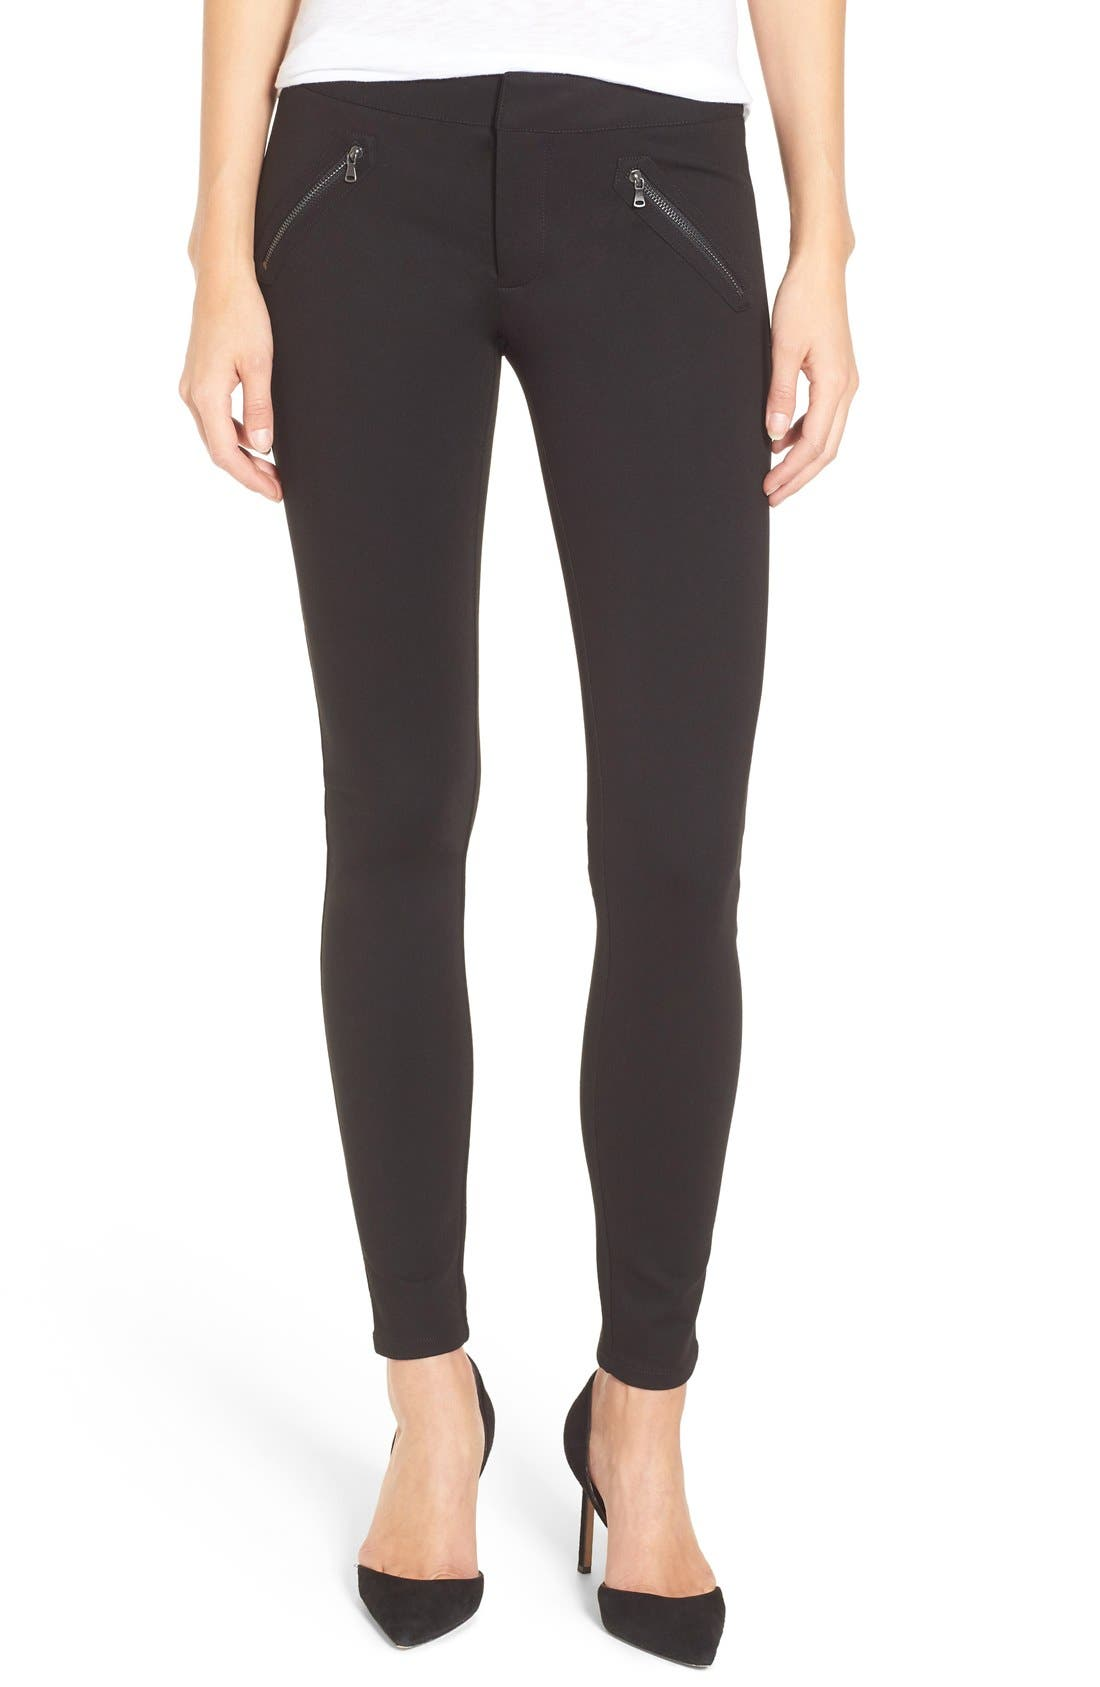 Paige Denim 'Clarence' Skinny Zip Pants